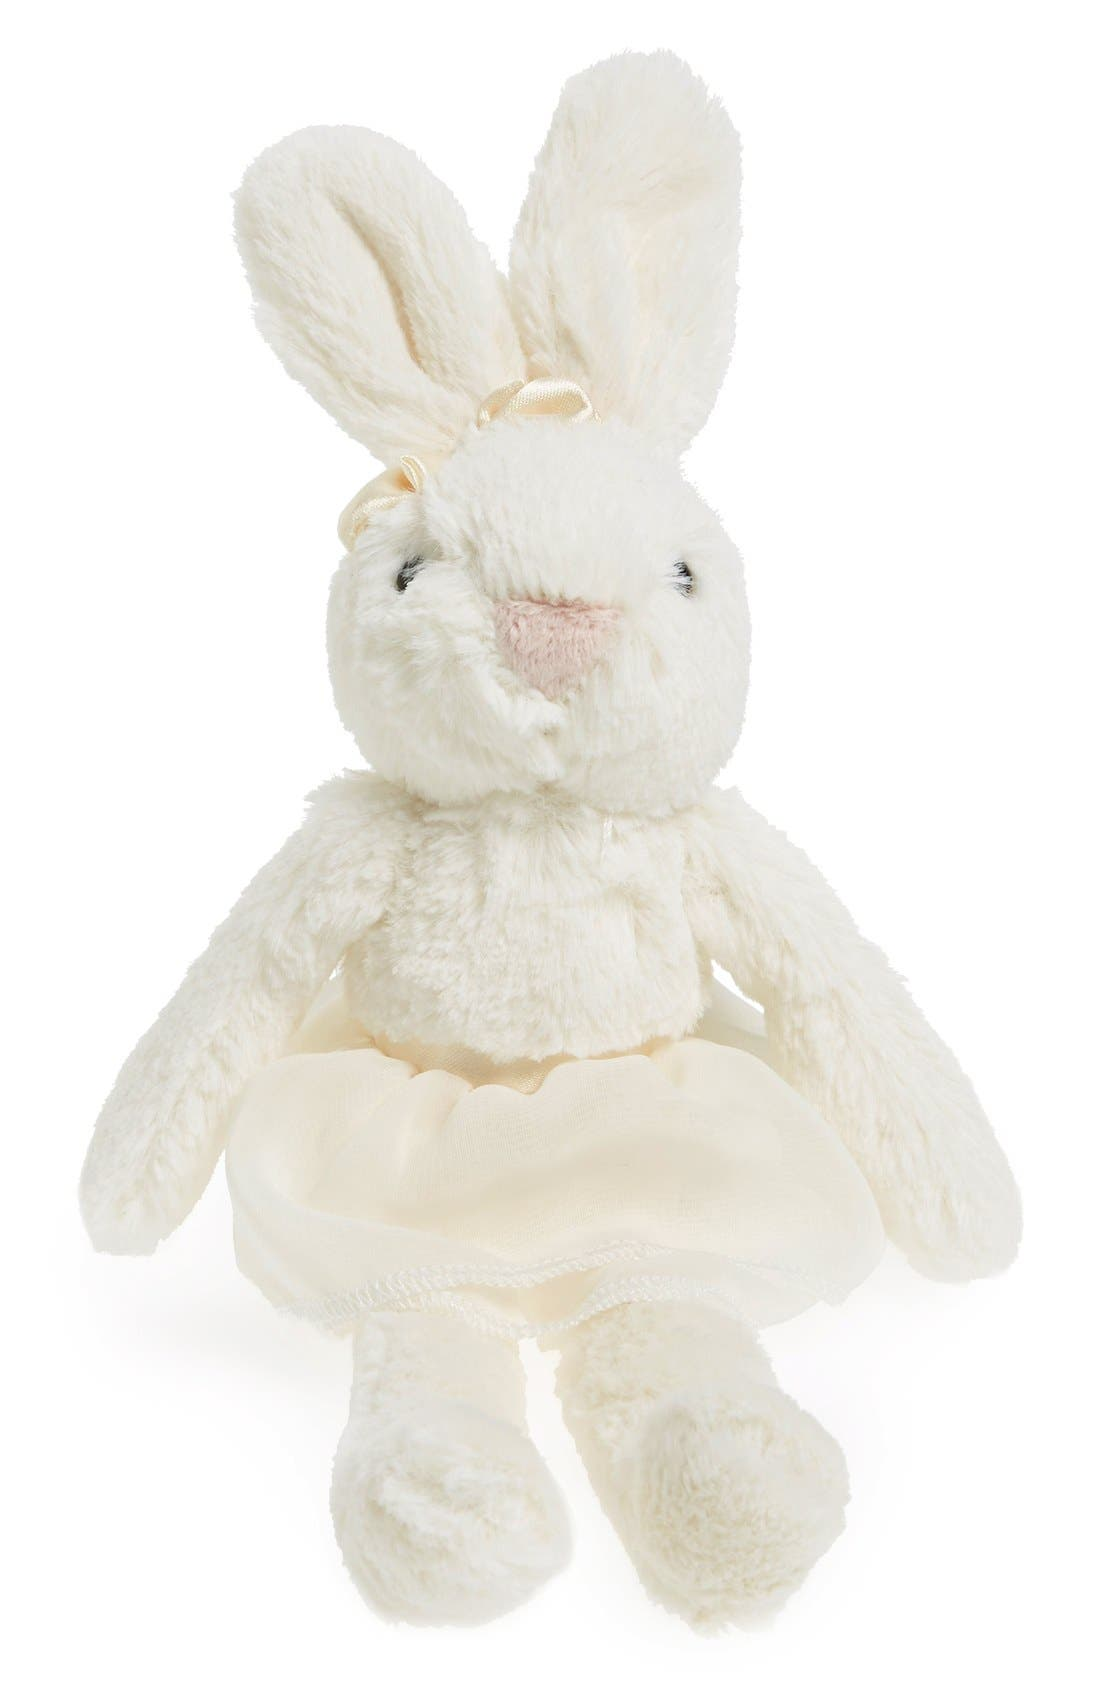 Alternate Image 1 Selected - Jellycat 'Plum Bunny' Stuffed Animal